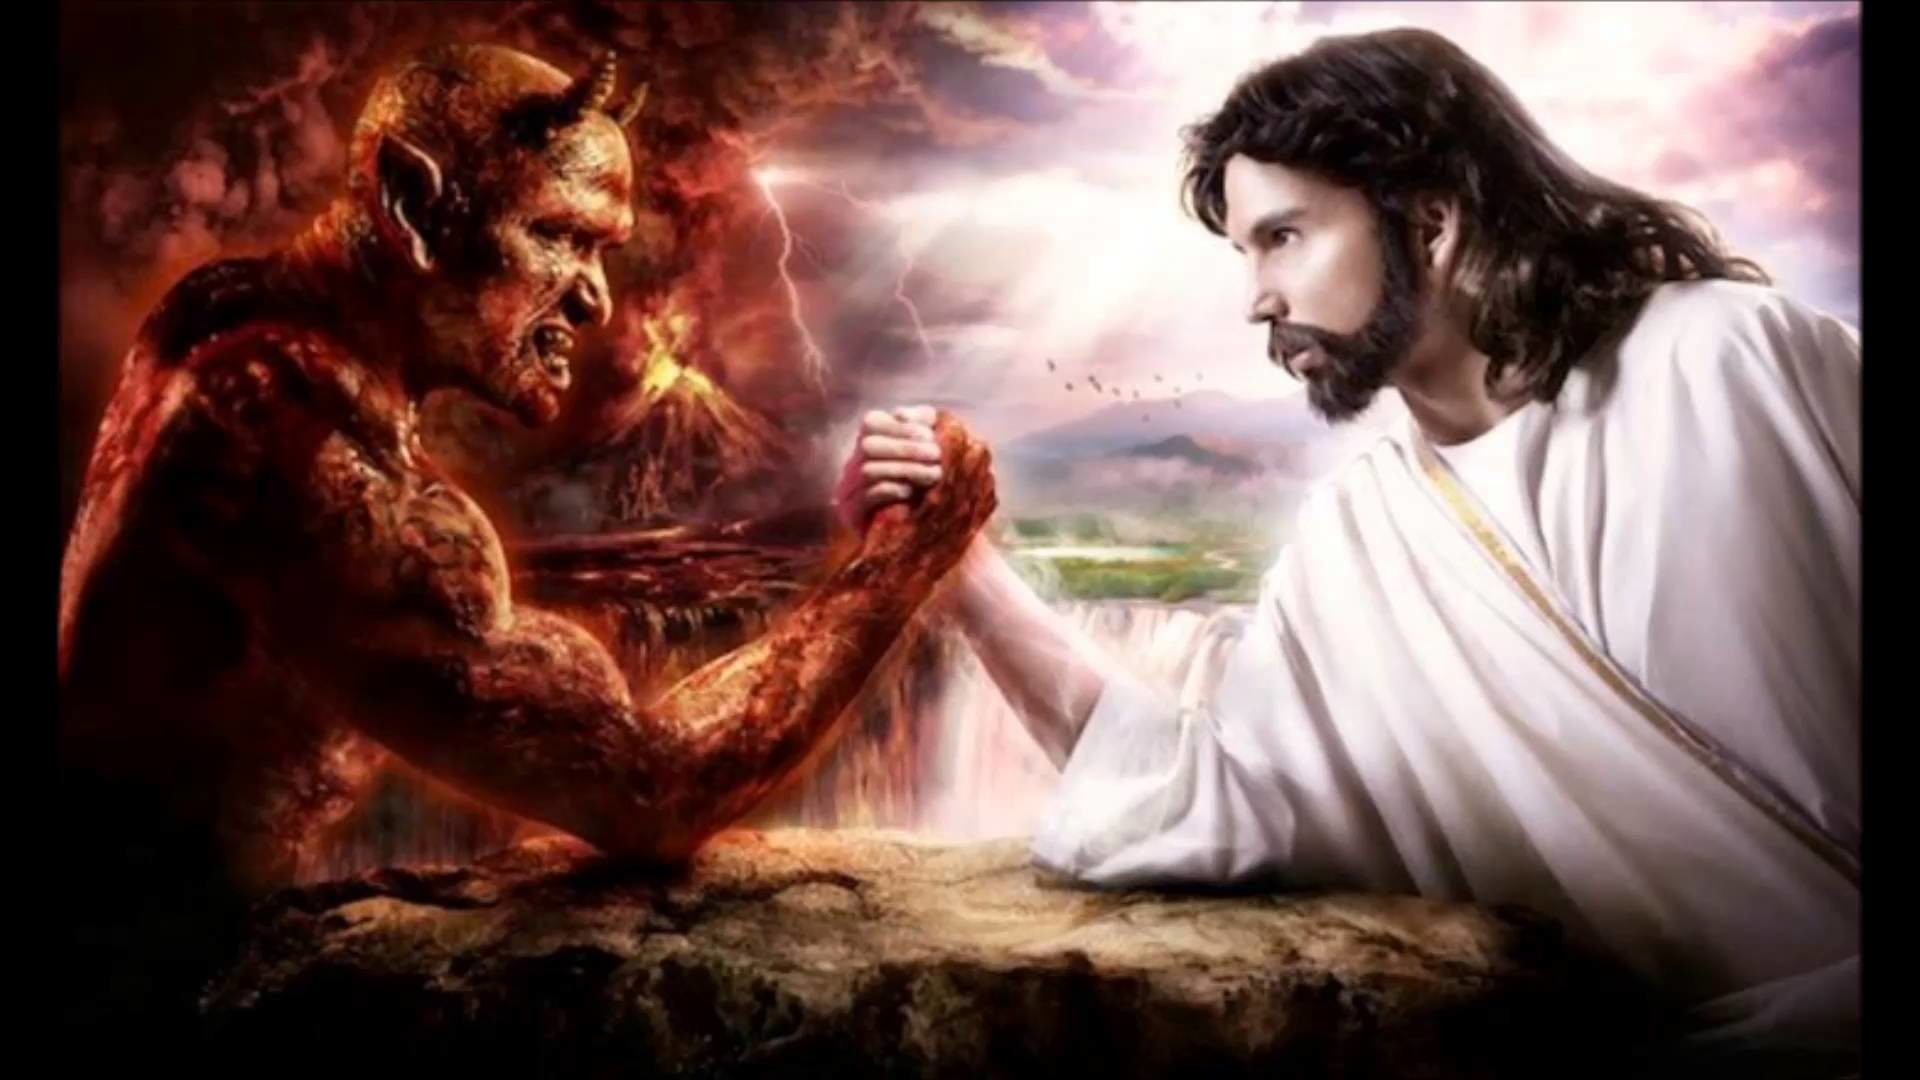 hell vs heaven fl studio 12